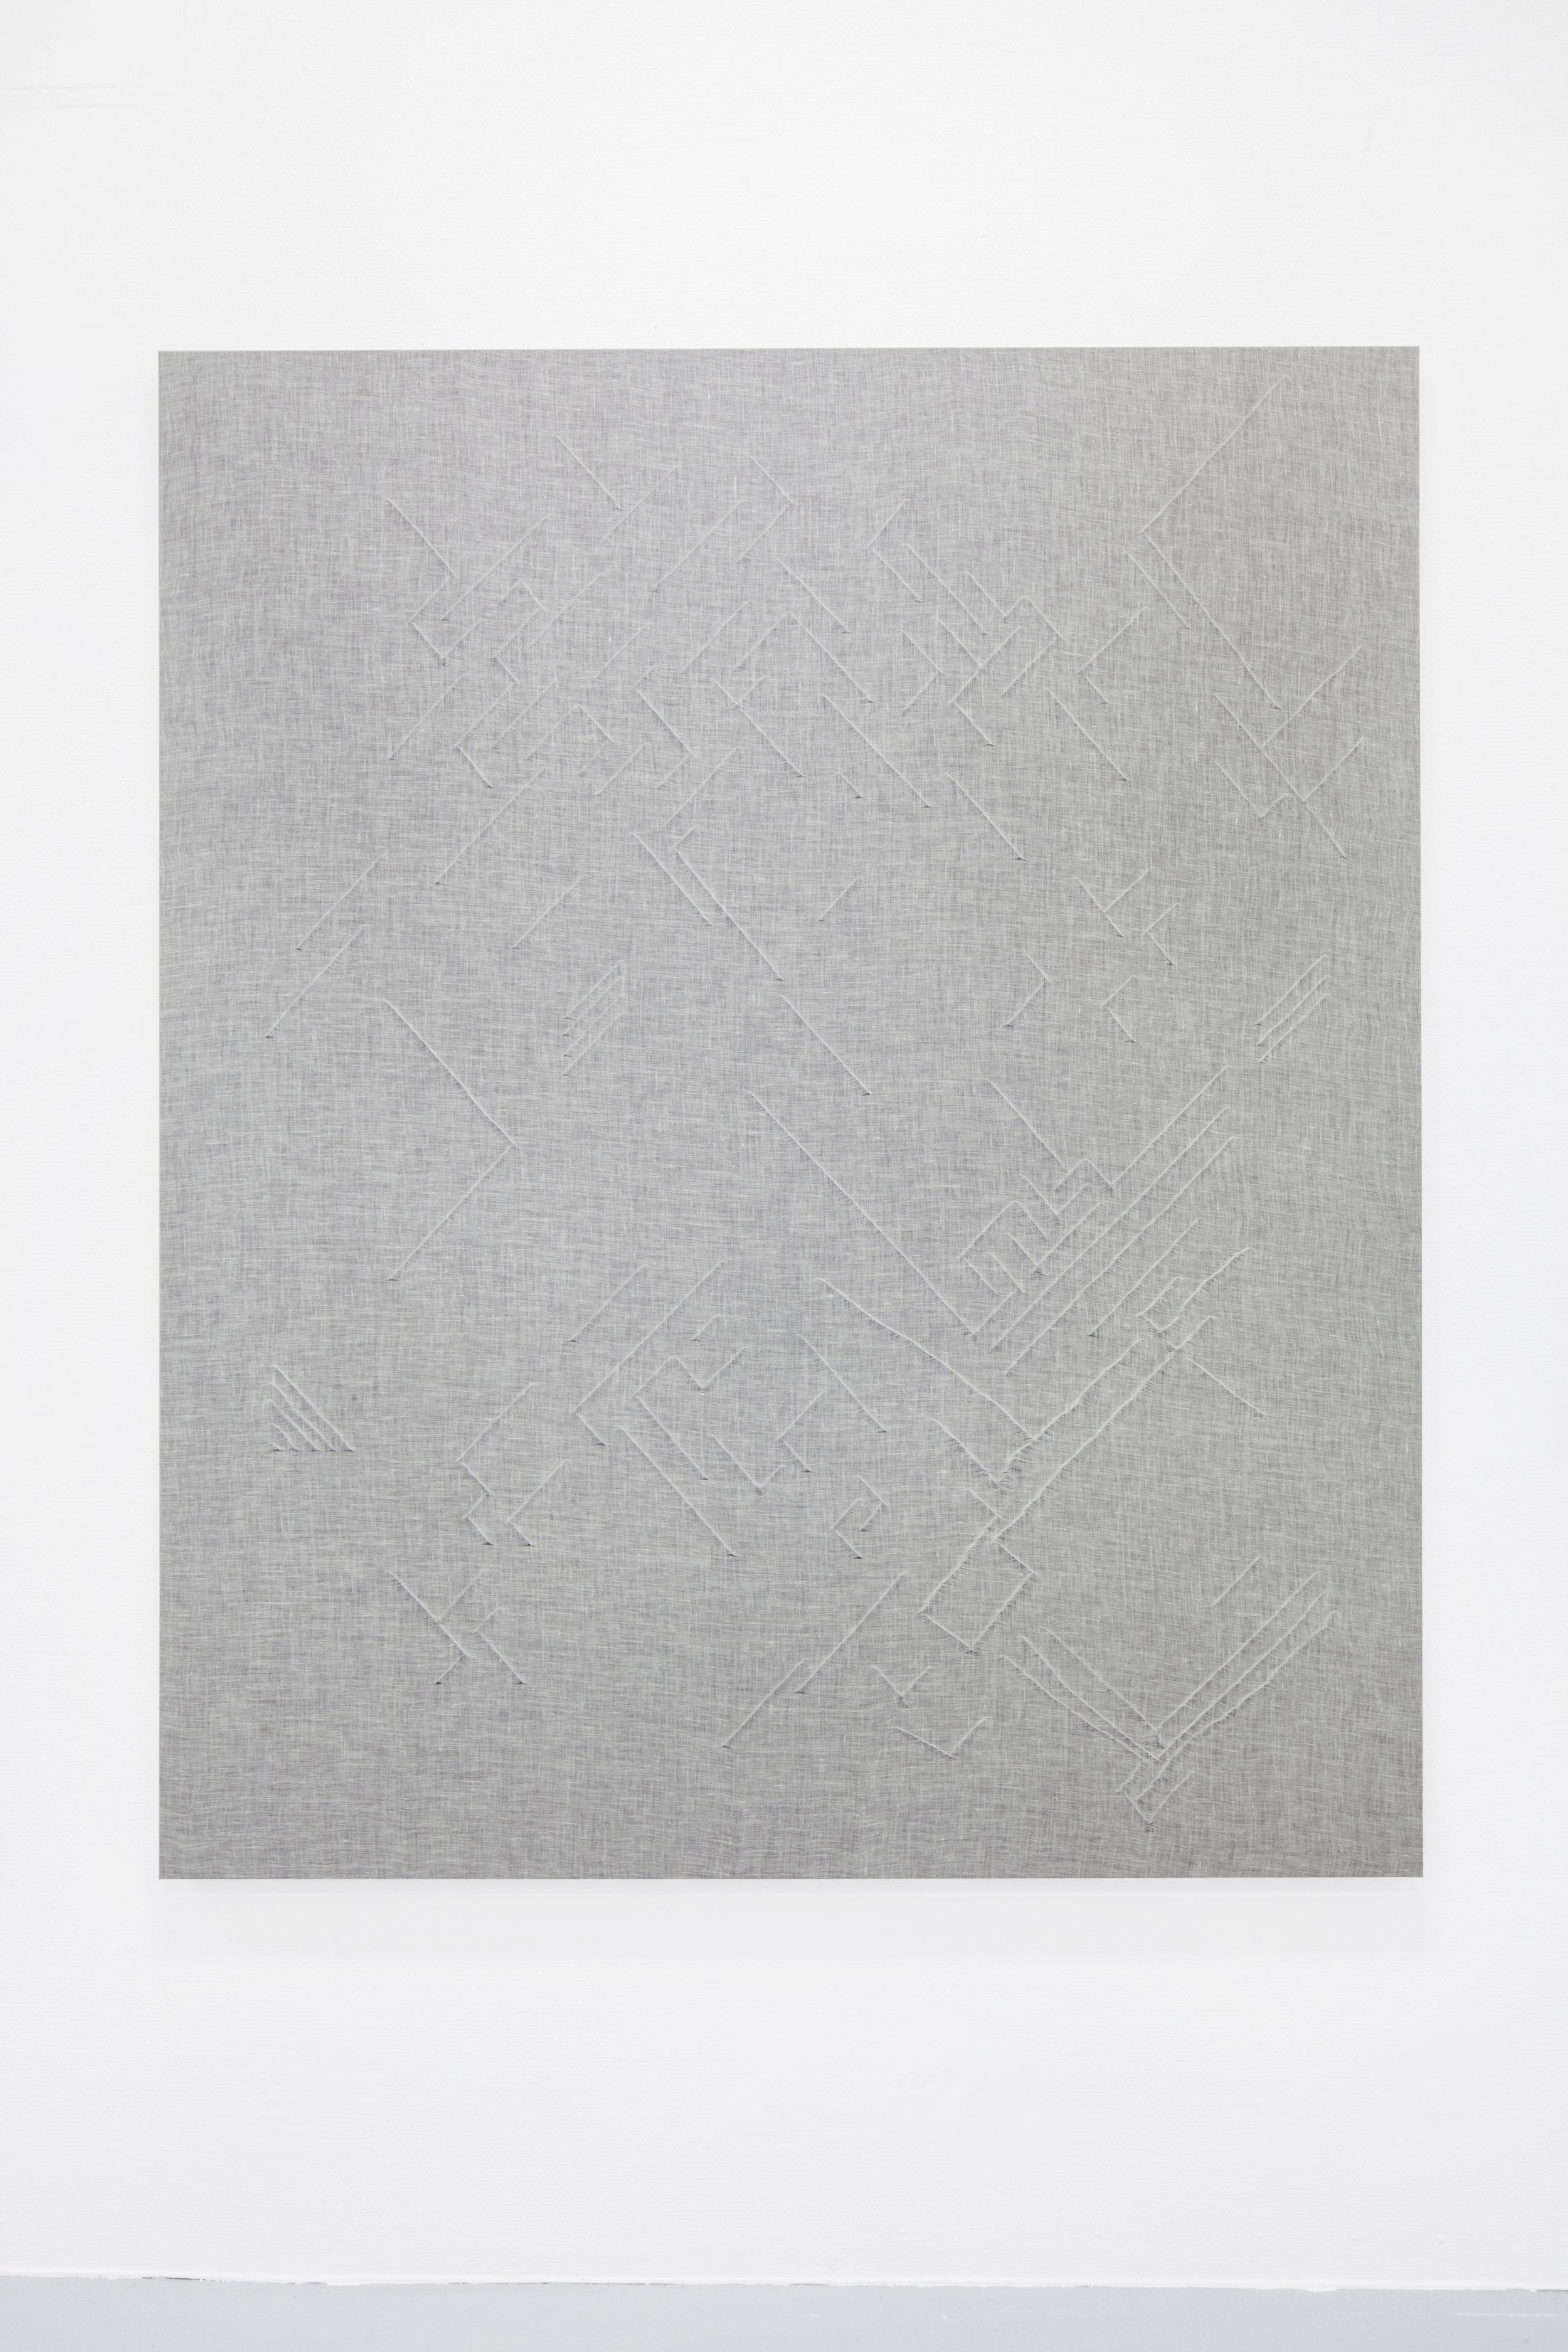 Cortex, muslin fabric, cotton canvas wooden frame, 2016